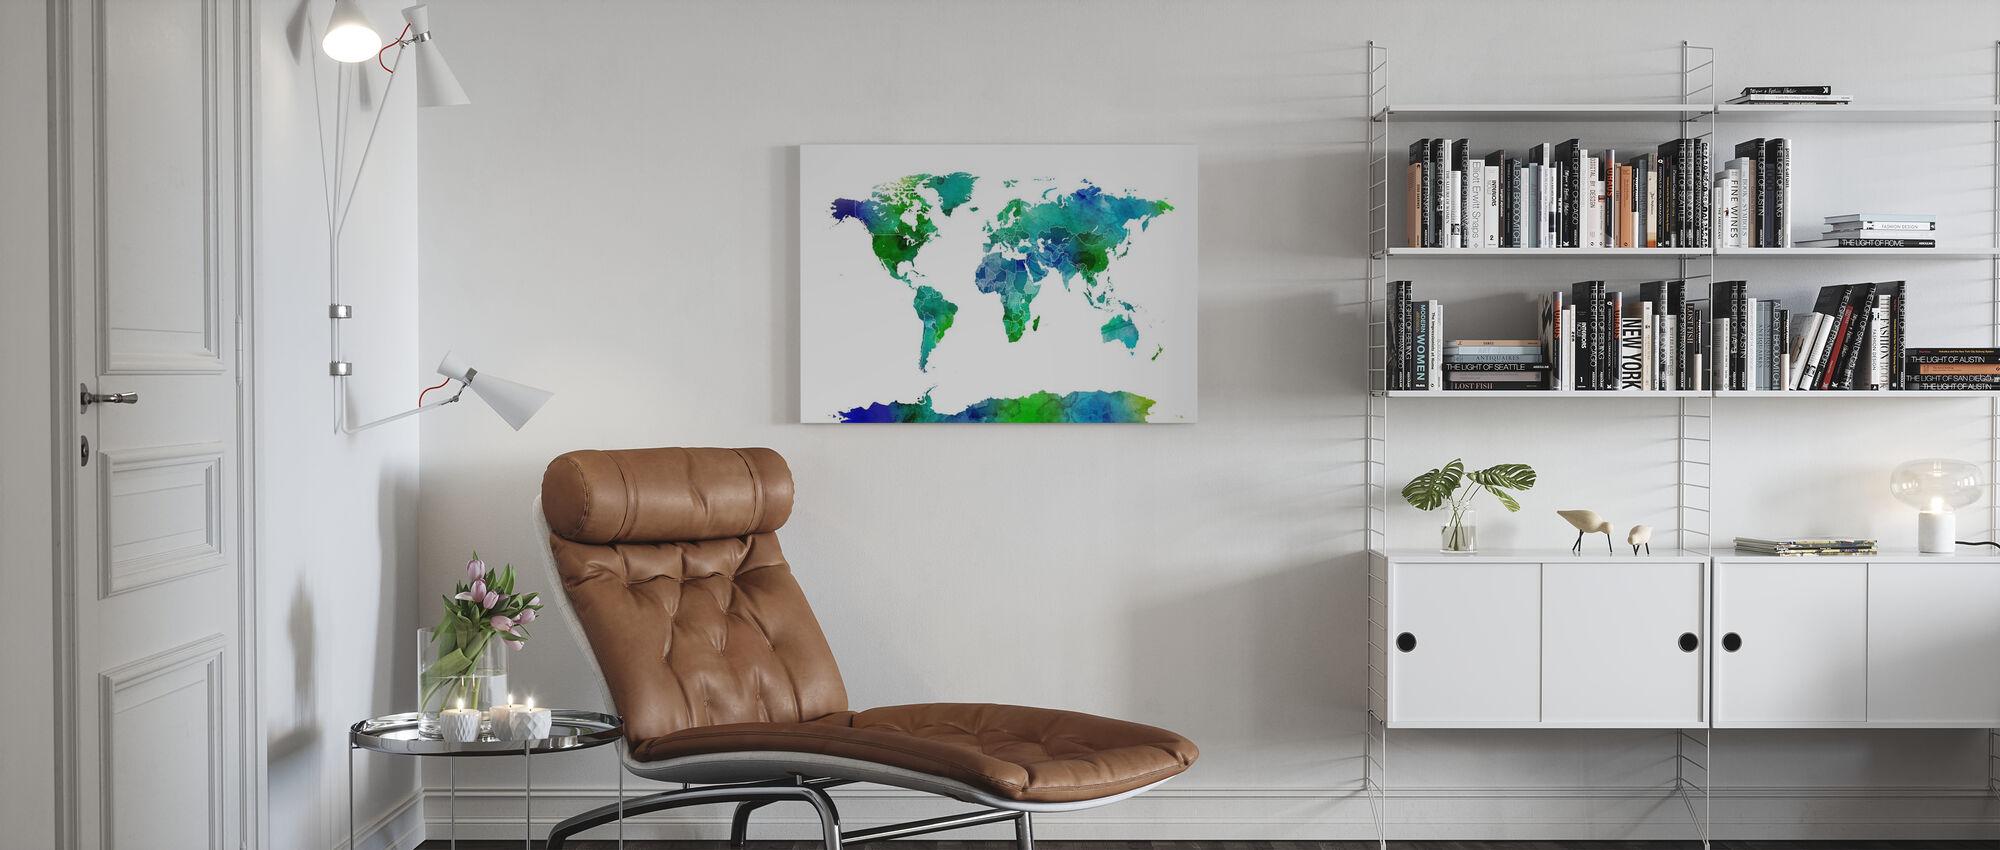 Akvarell världskarta Blå & Grön - Canvastavla - Vardagsrum